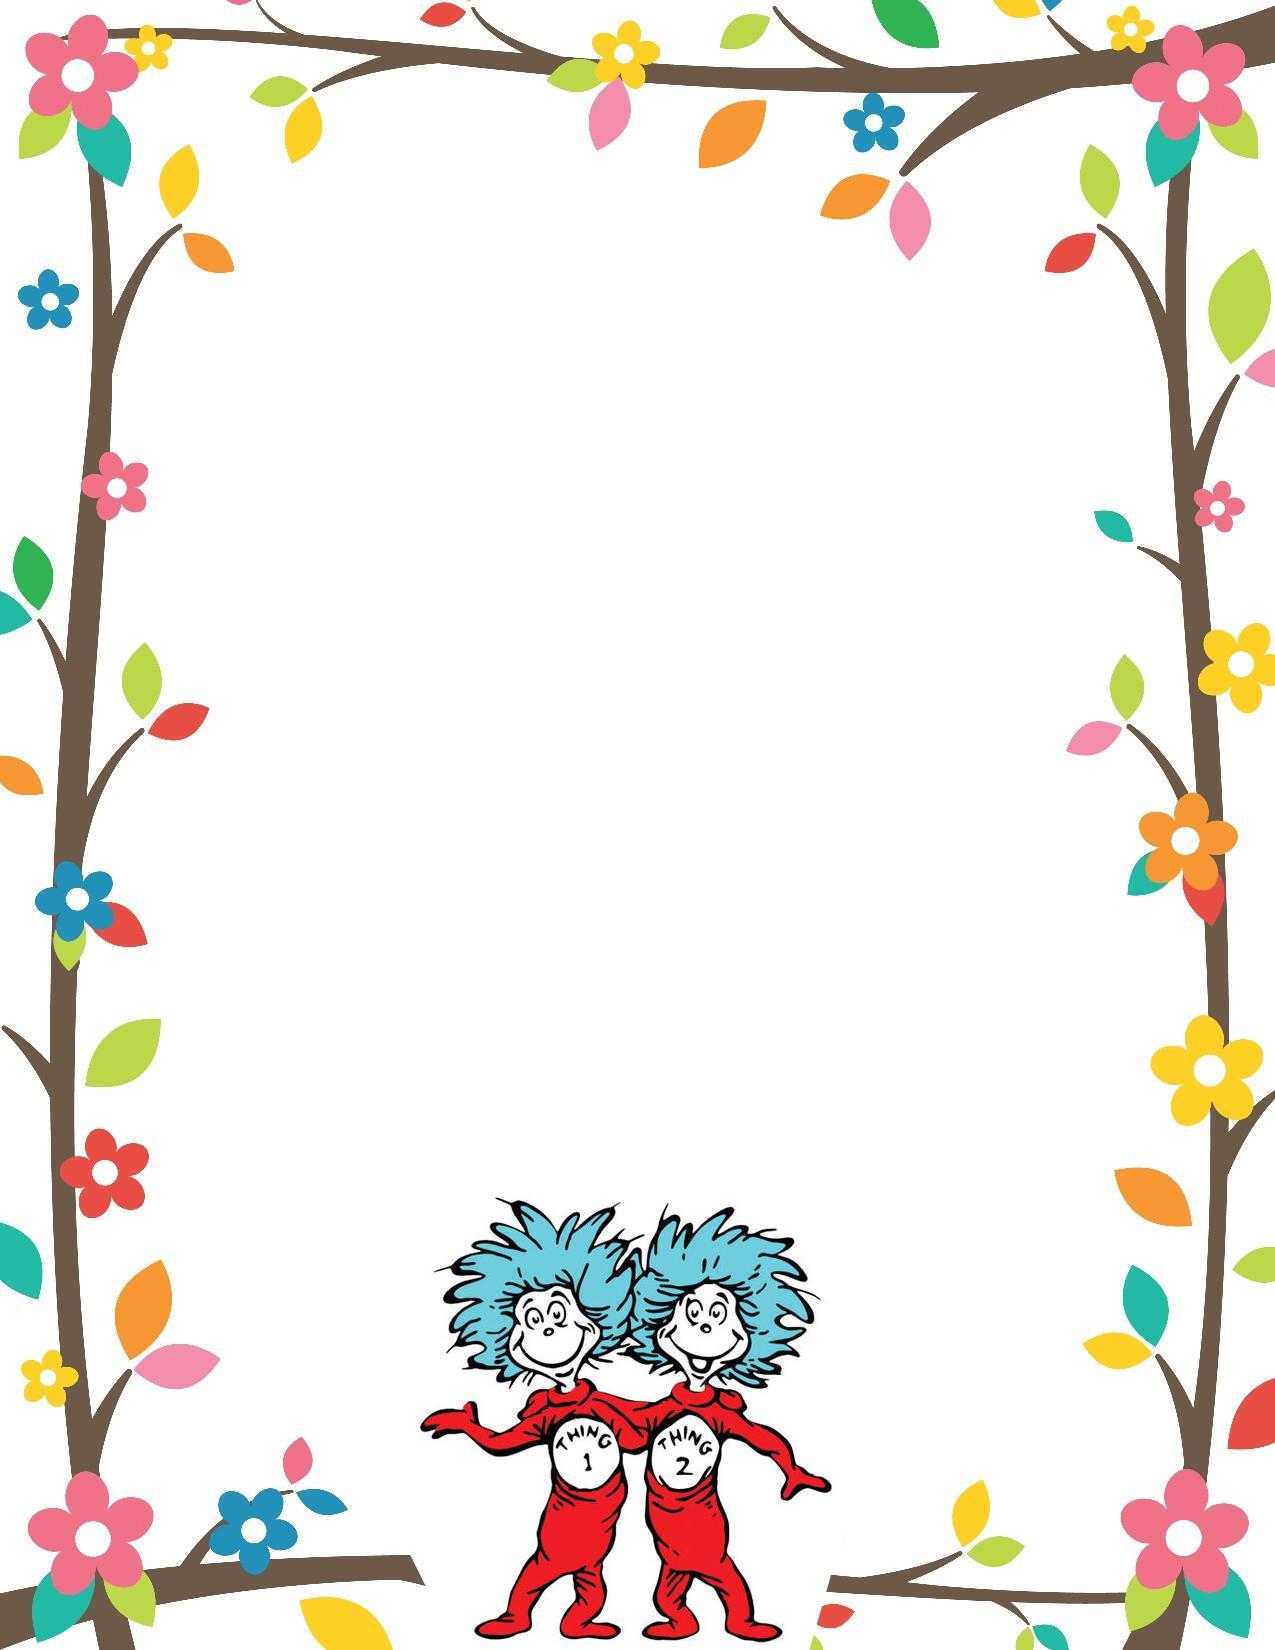 Dr Seuss Border Invitation Free Print.